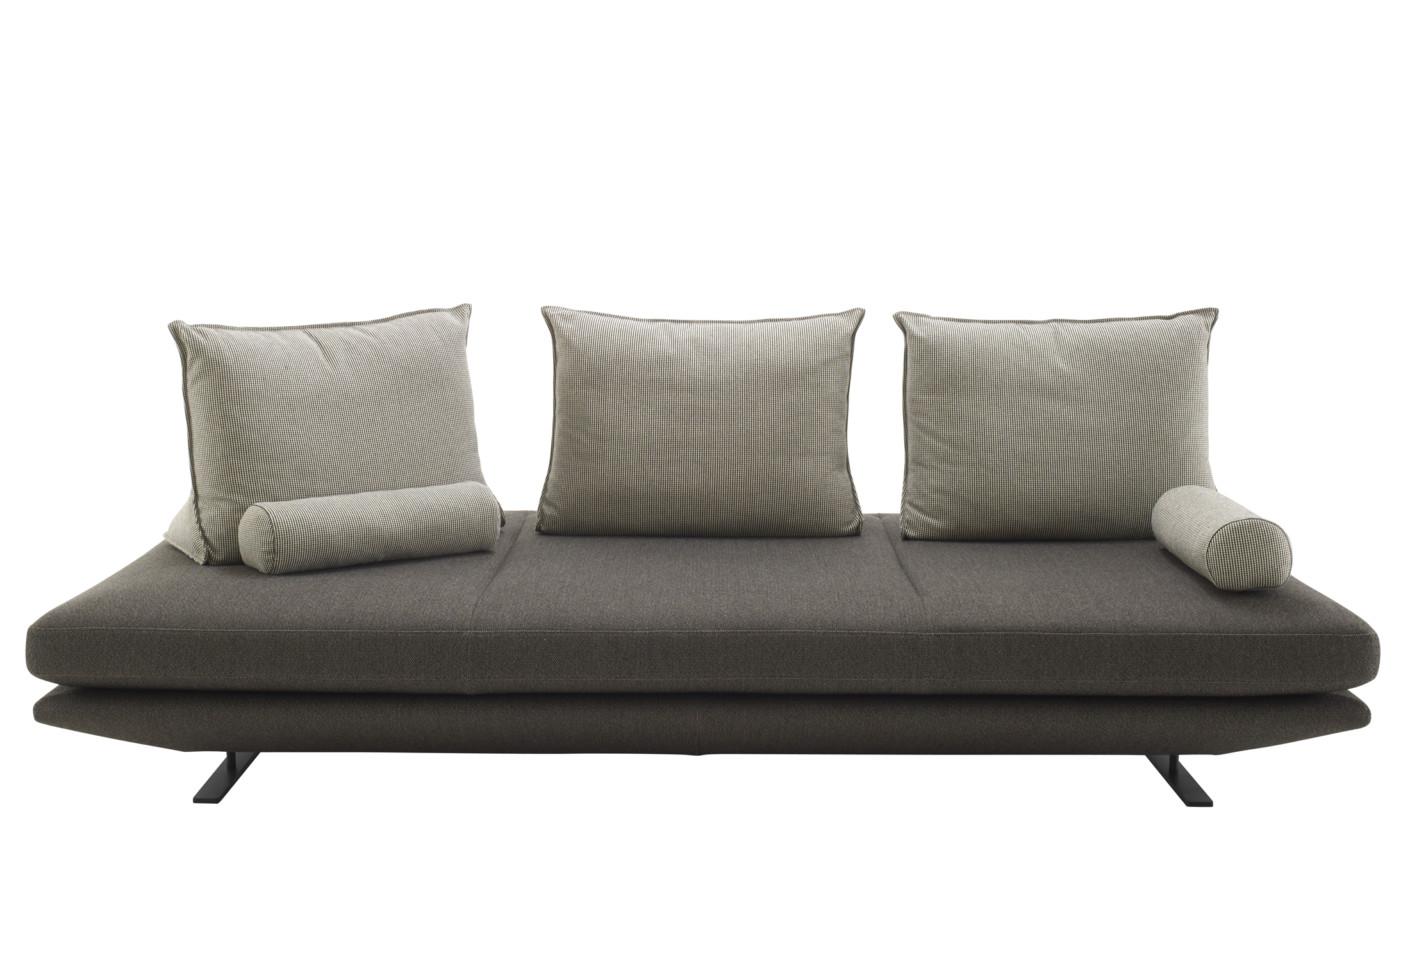 Prado by ligne roset stylepark for Sofa bed germany